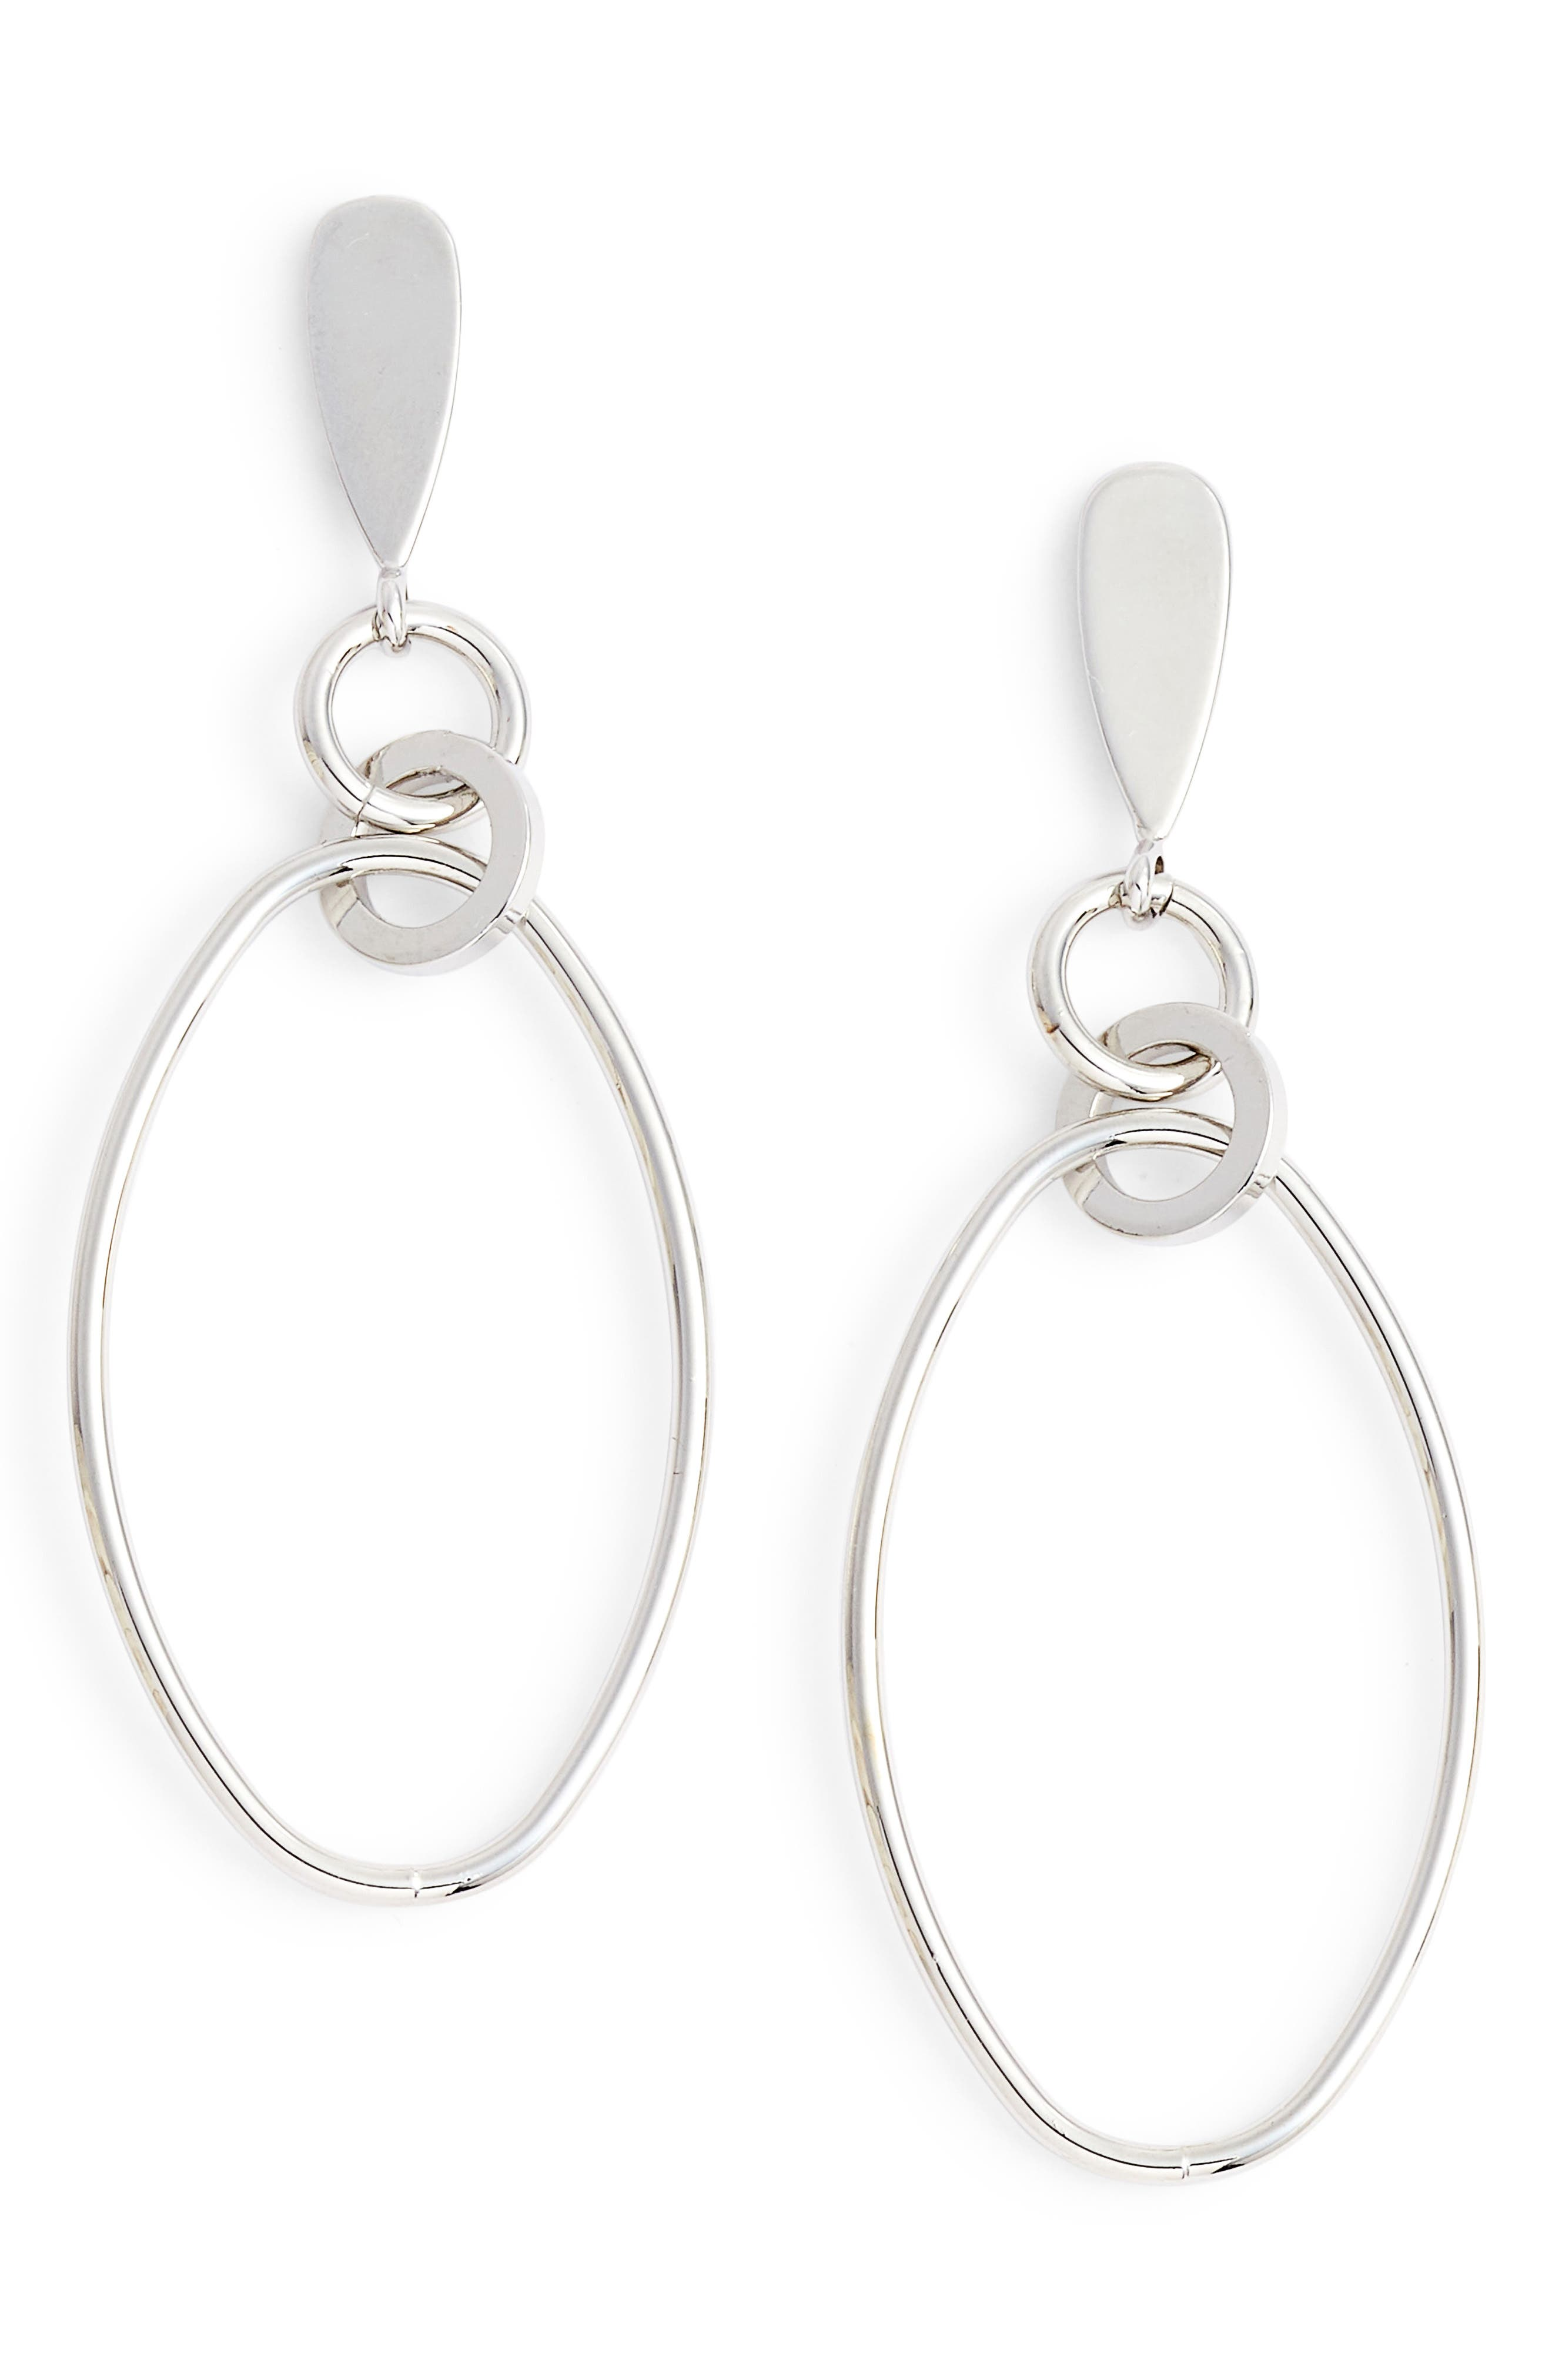 Oval Orbit Front Hoop Earrings,                         Main,                         color, 040